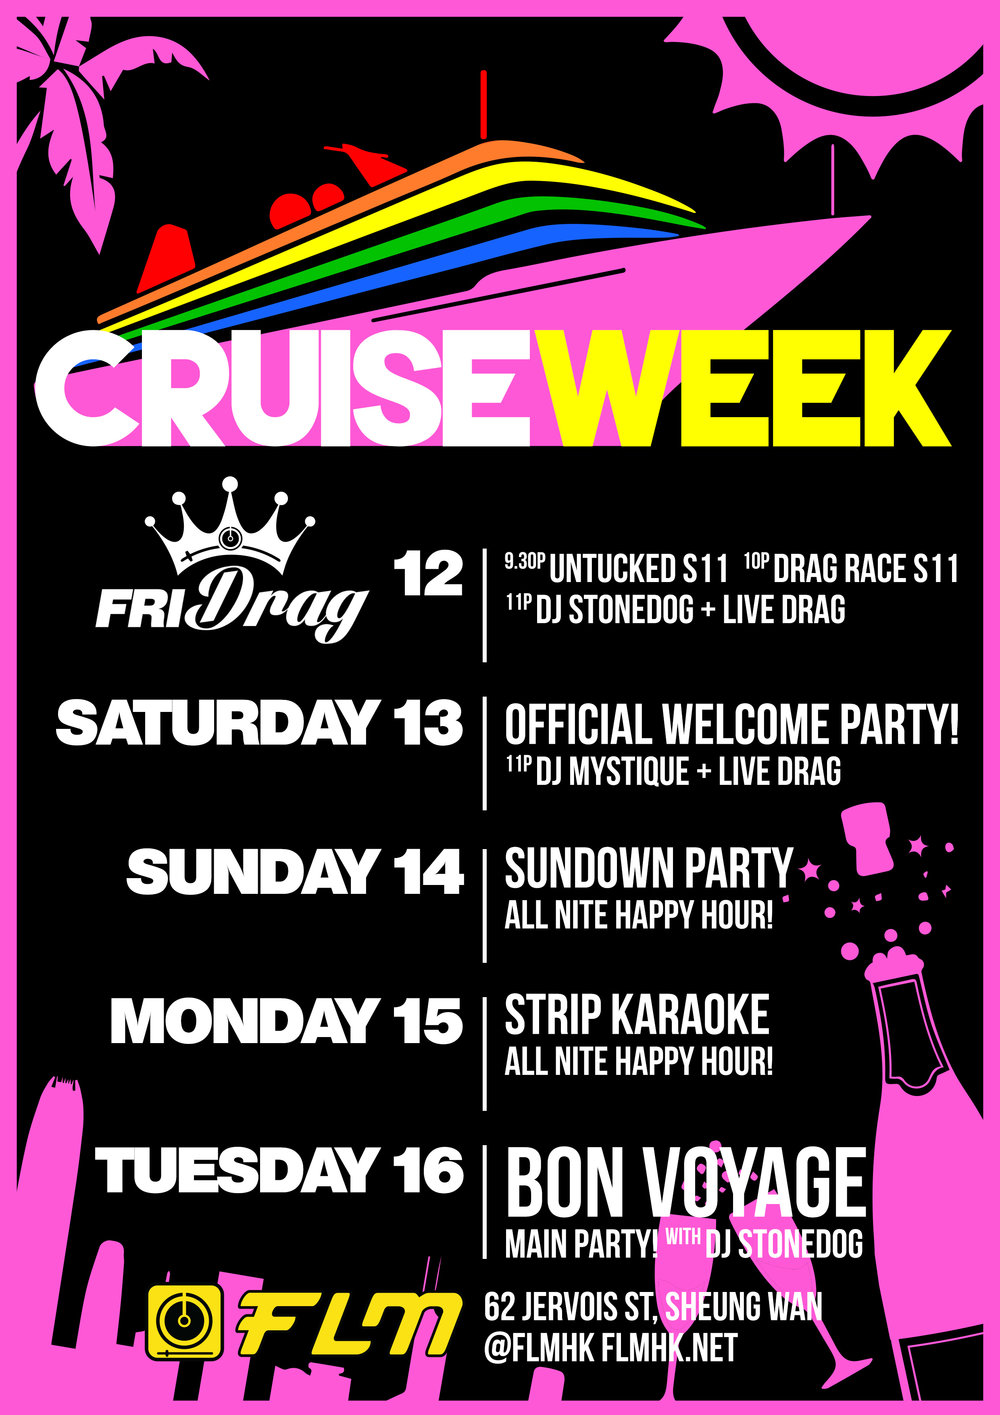 2019-04-04-Cruise-Poster-lineup.jpg